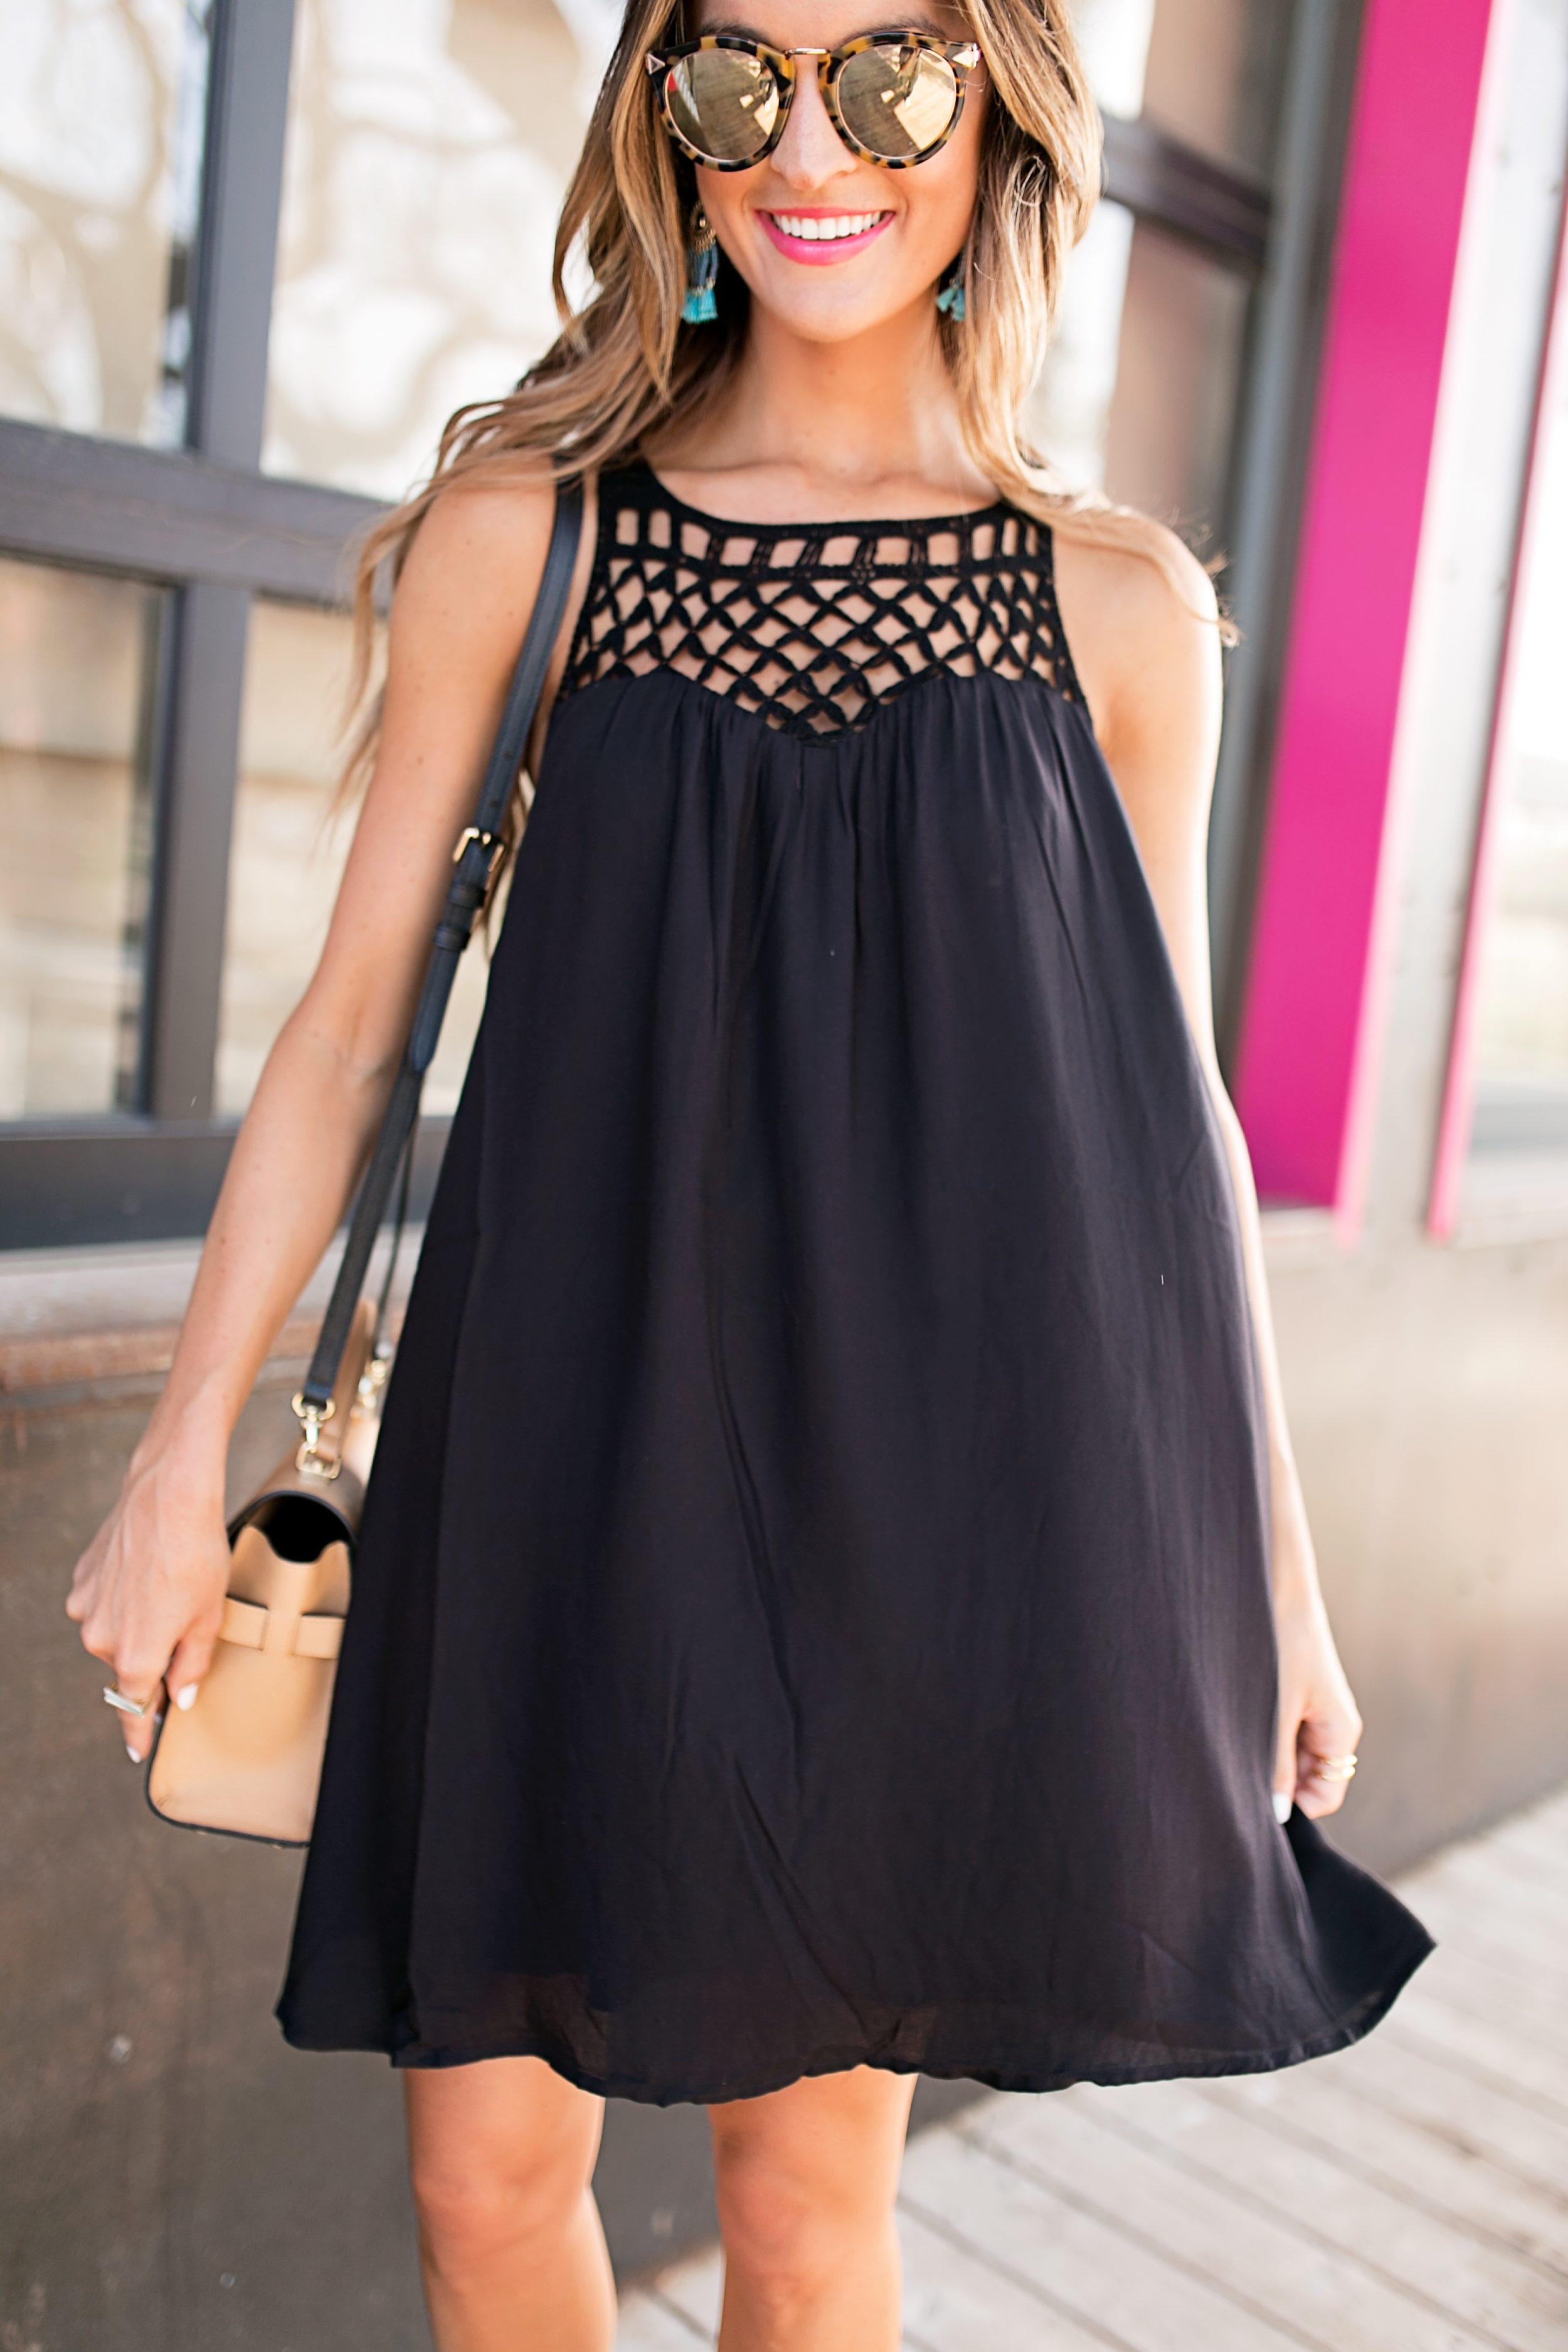 budget-friendly little black dress + espadrille wedges - Lauren Kay Sims